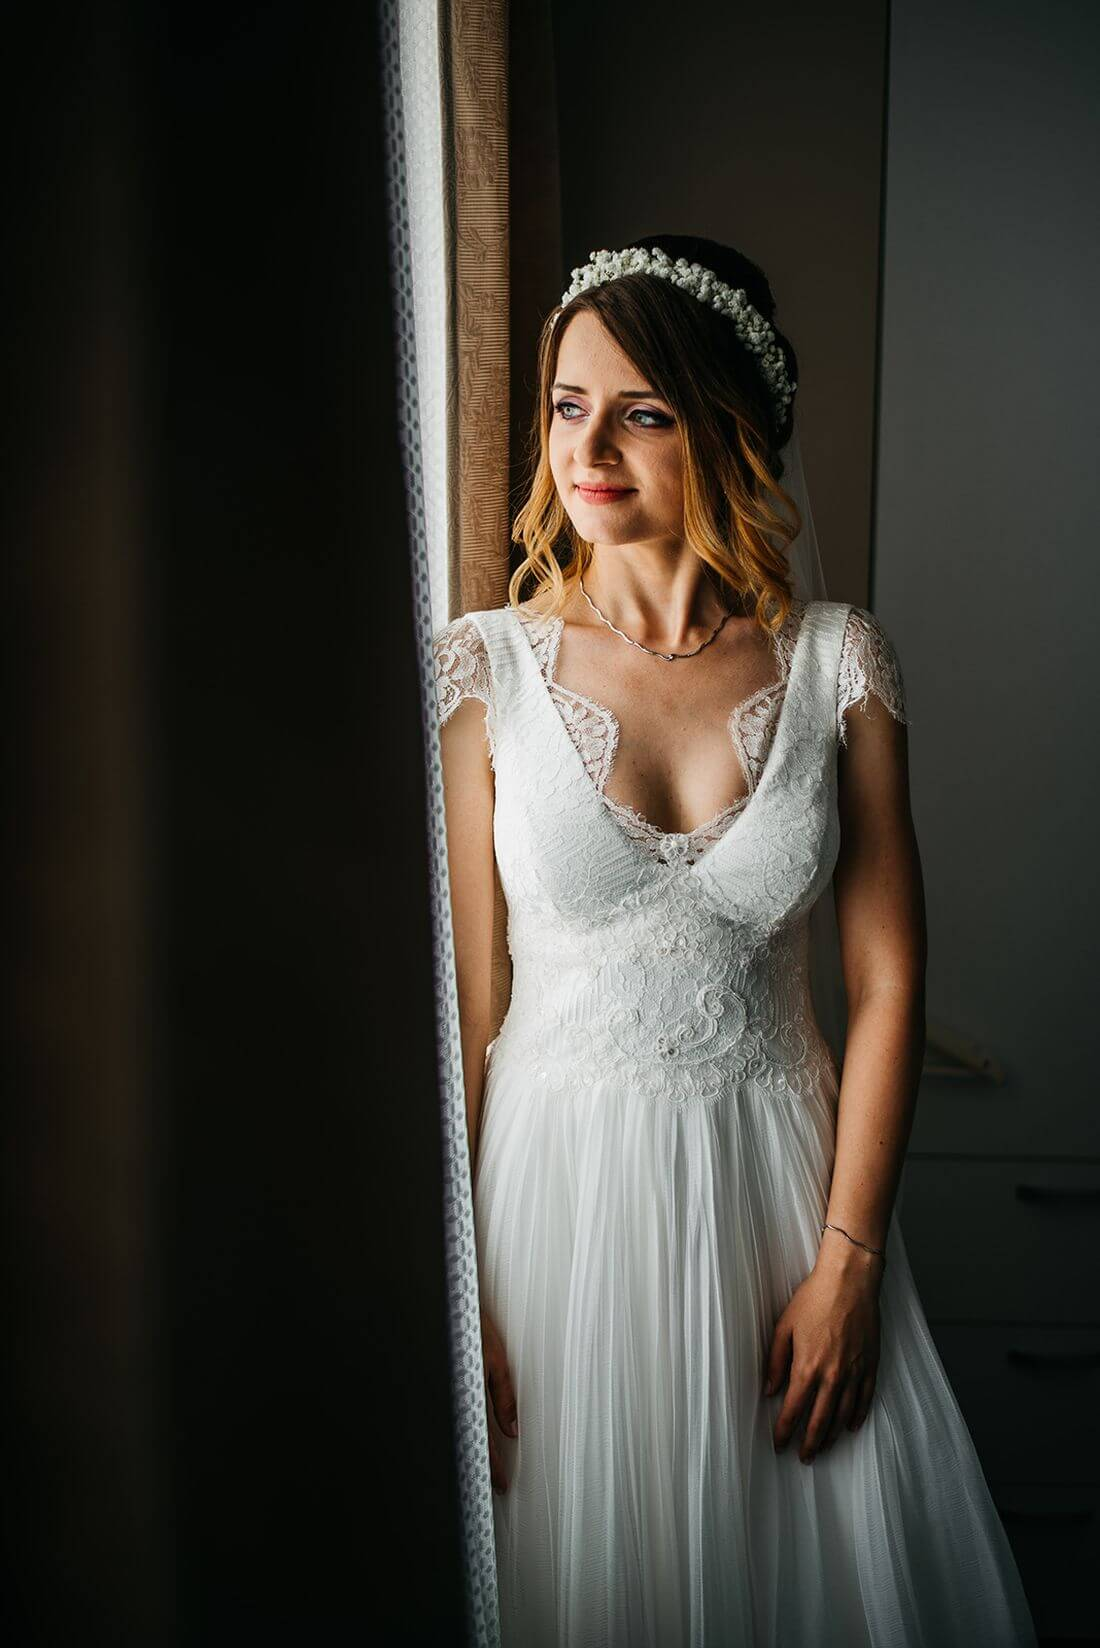 -Nunta in varf de munte – Magda si Vlad-30 iunie 2018-IDO-Weddings-nuntiinaerliber.ro